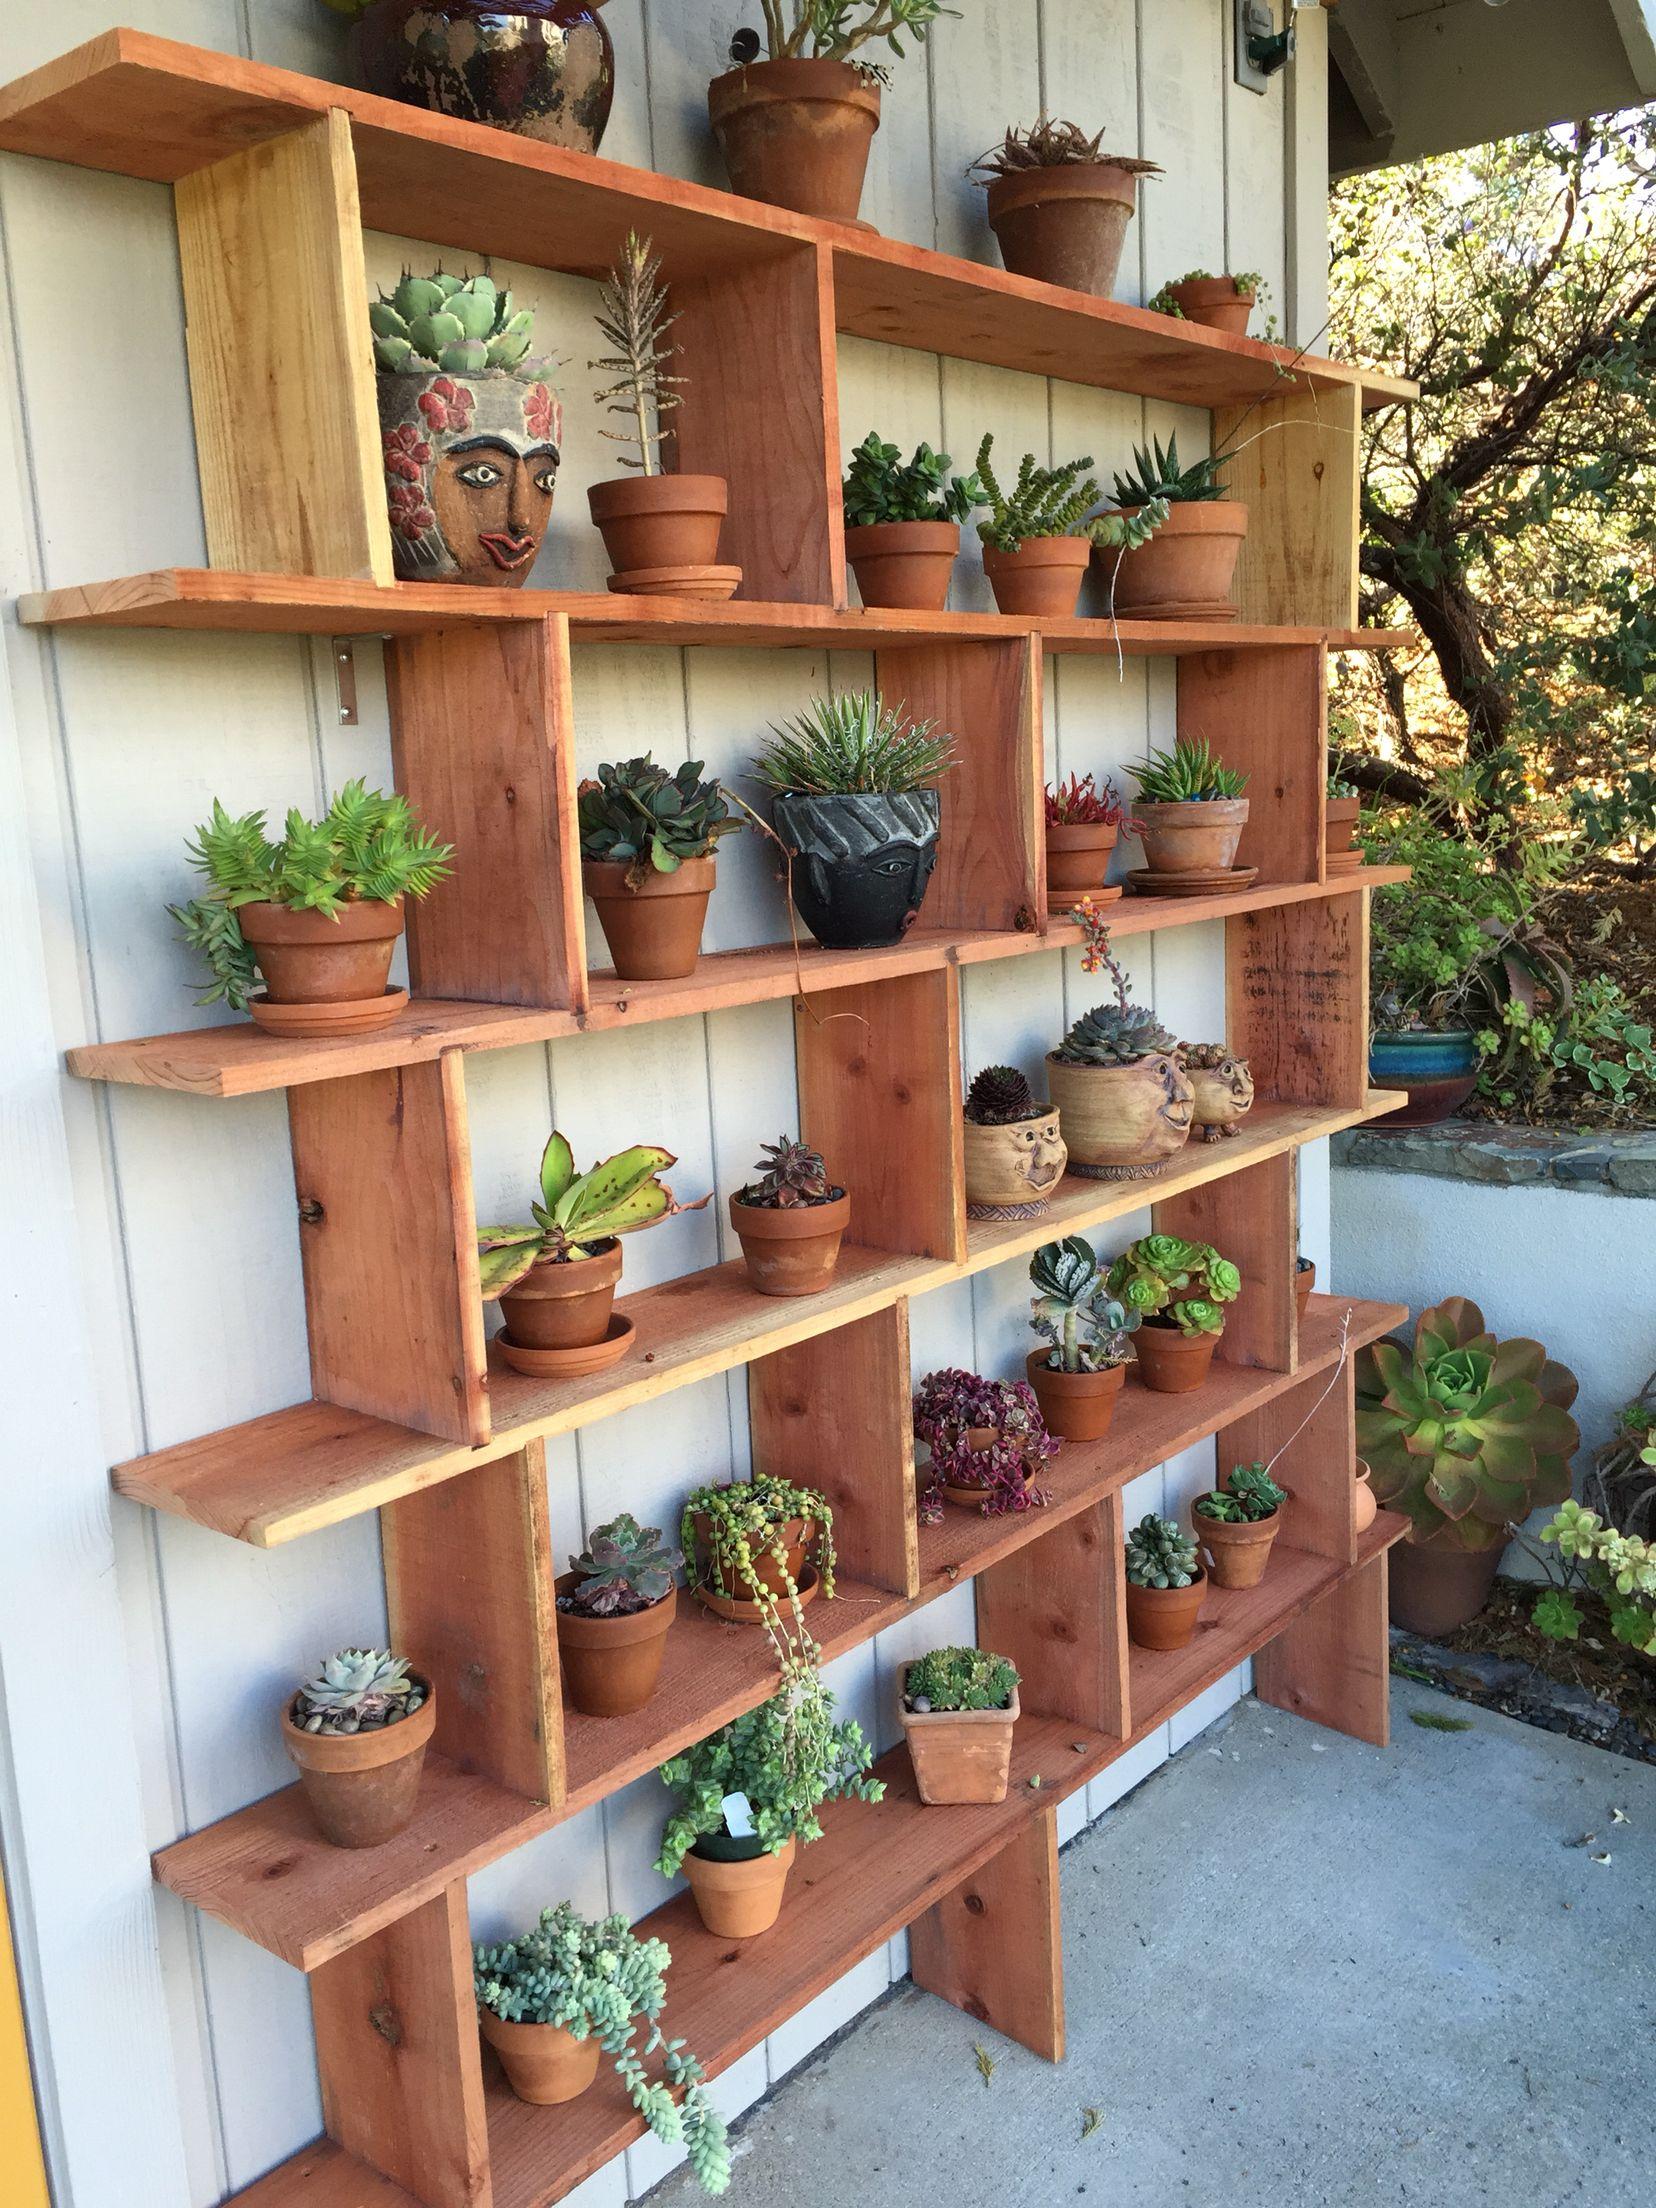 My Husbands Wonderful Succulent Shelf